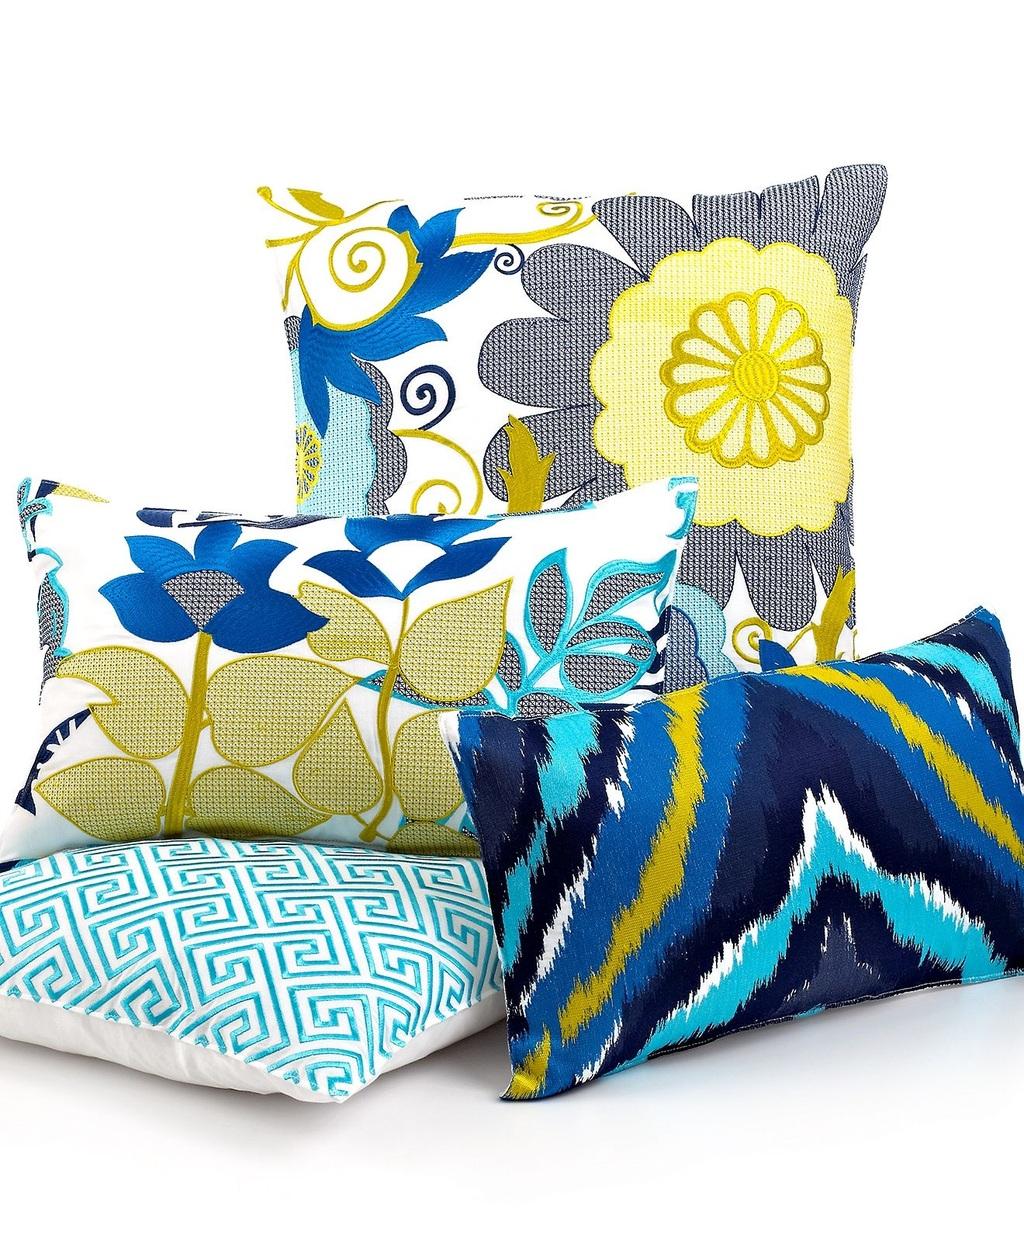 Trina Turk Bedding, Trellis Turquoise Geometric 18